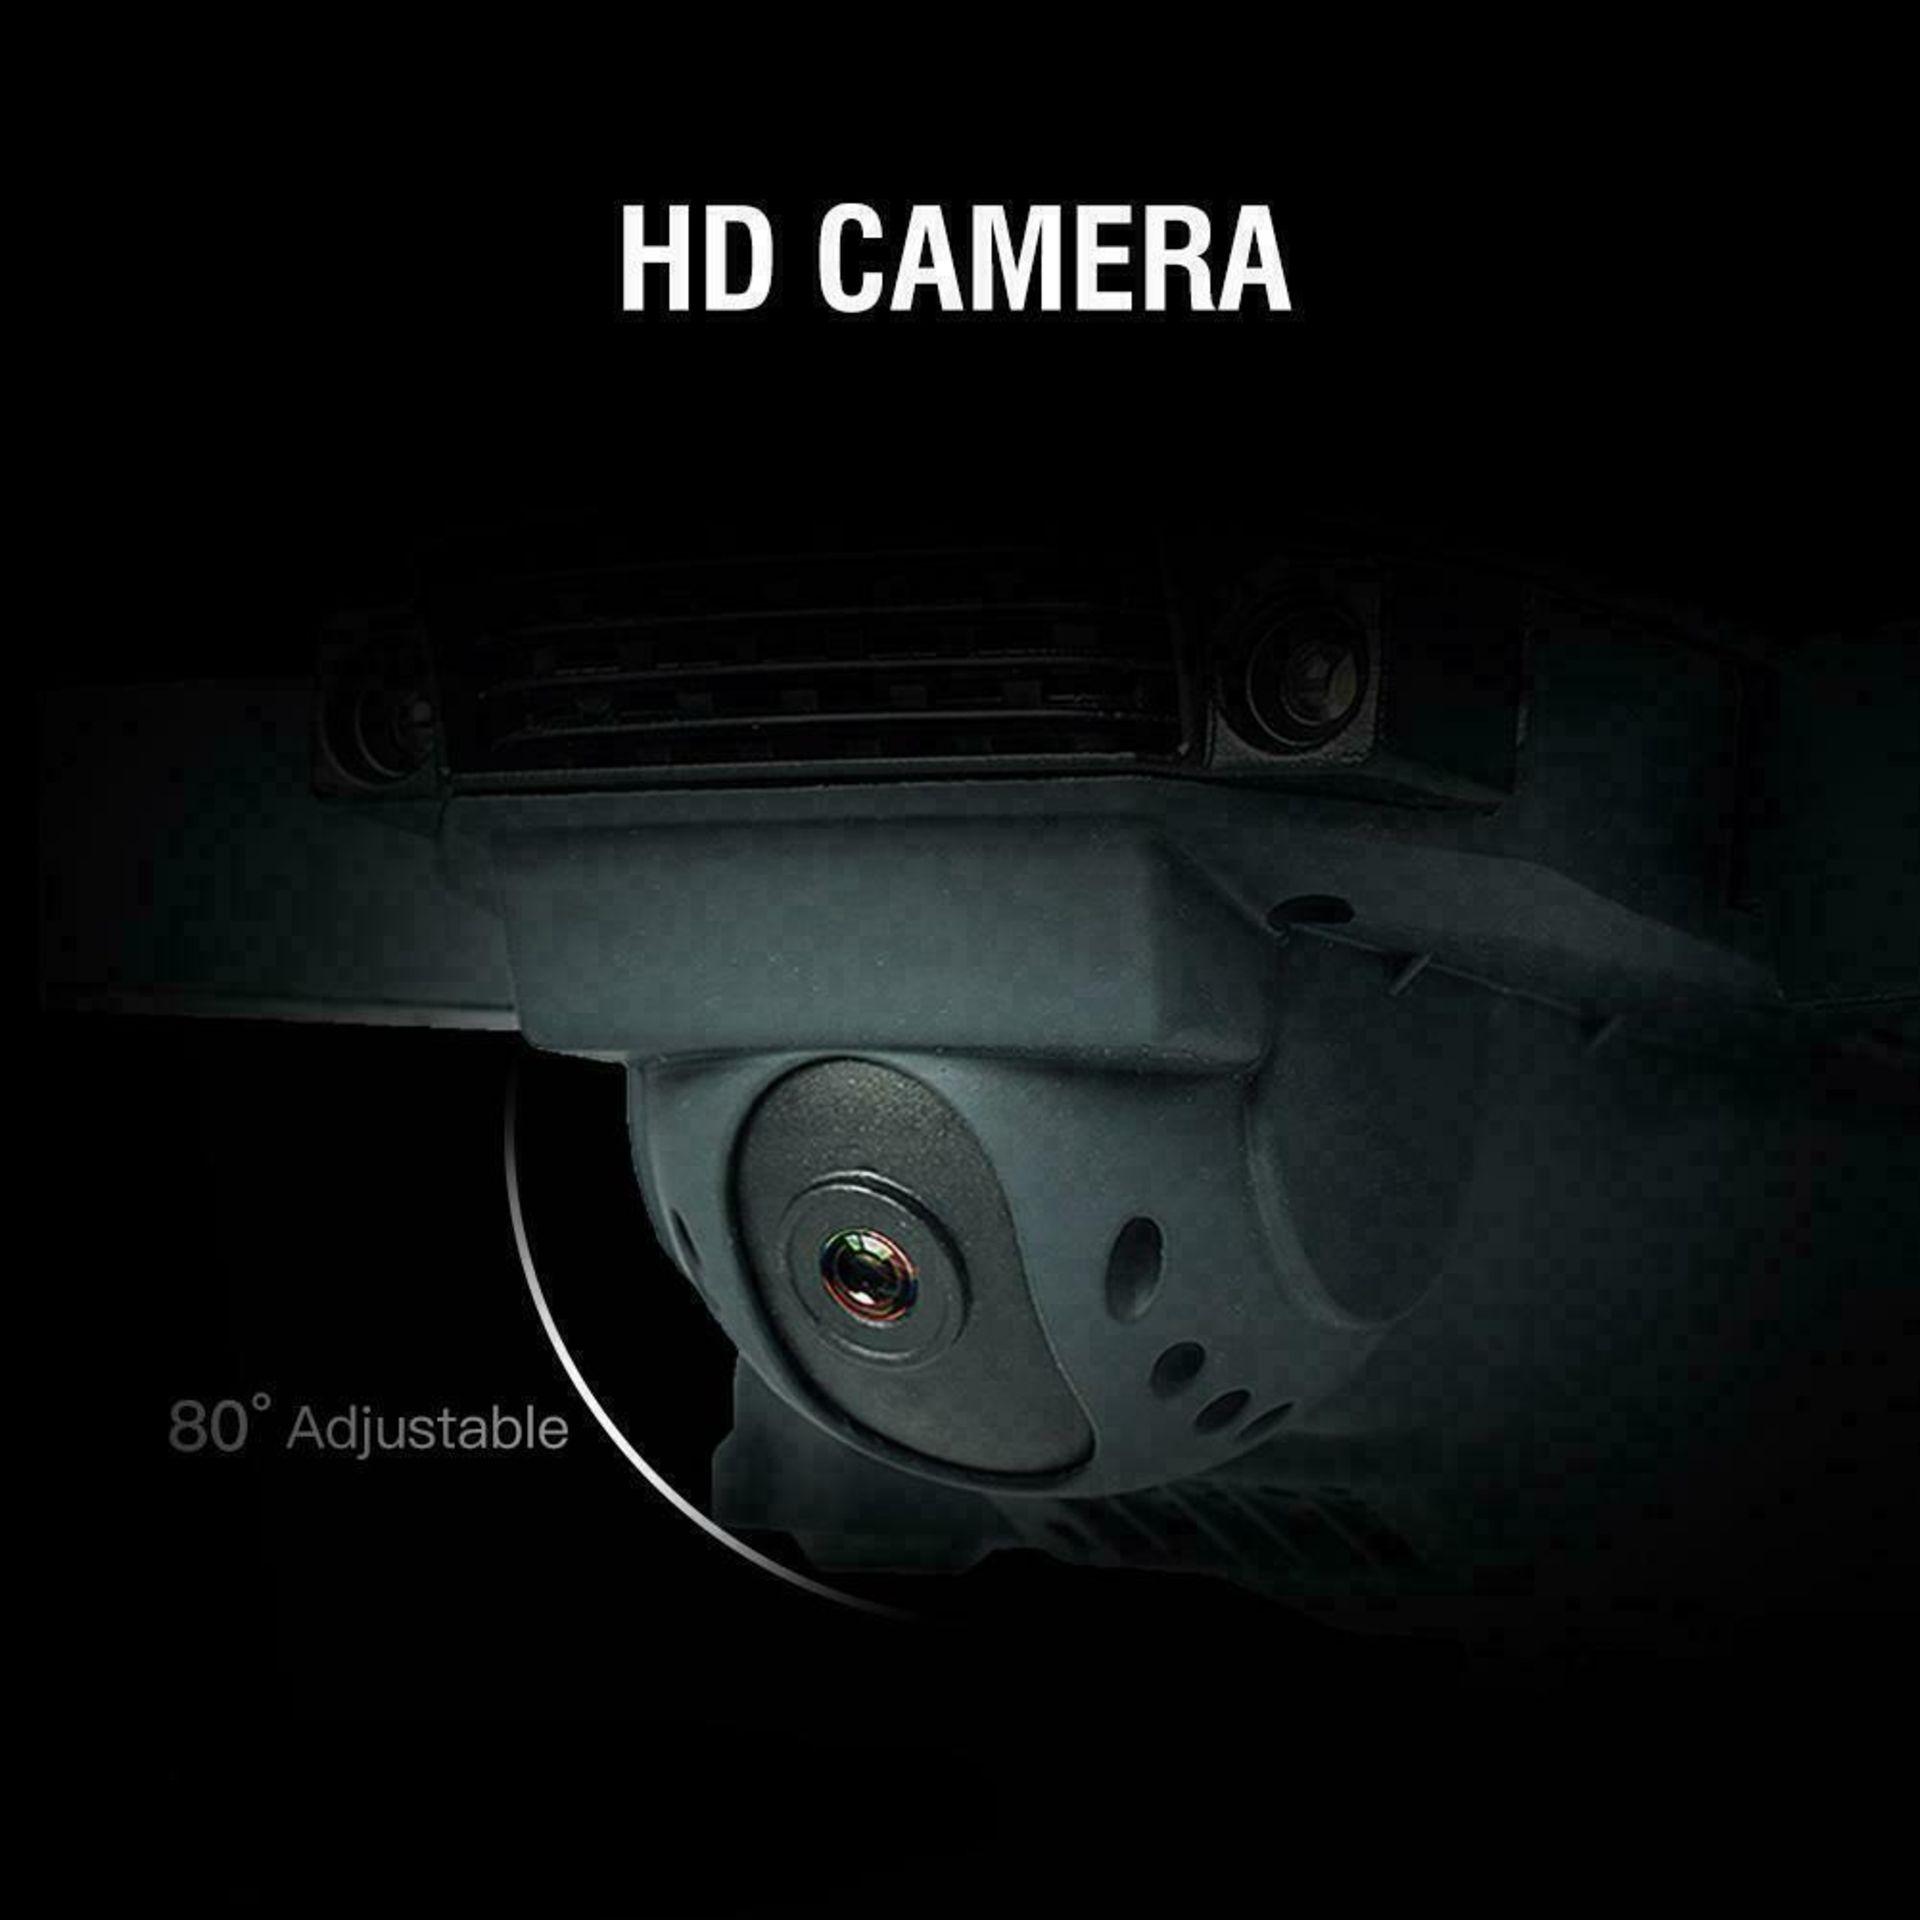 NEW & UNUSED DRONE X PRO WIFI FPV 1080P HD CAMERA FOLDABLE RC QUADCOPTER + BAG *PLUS VAT* - Image 3 of 9